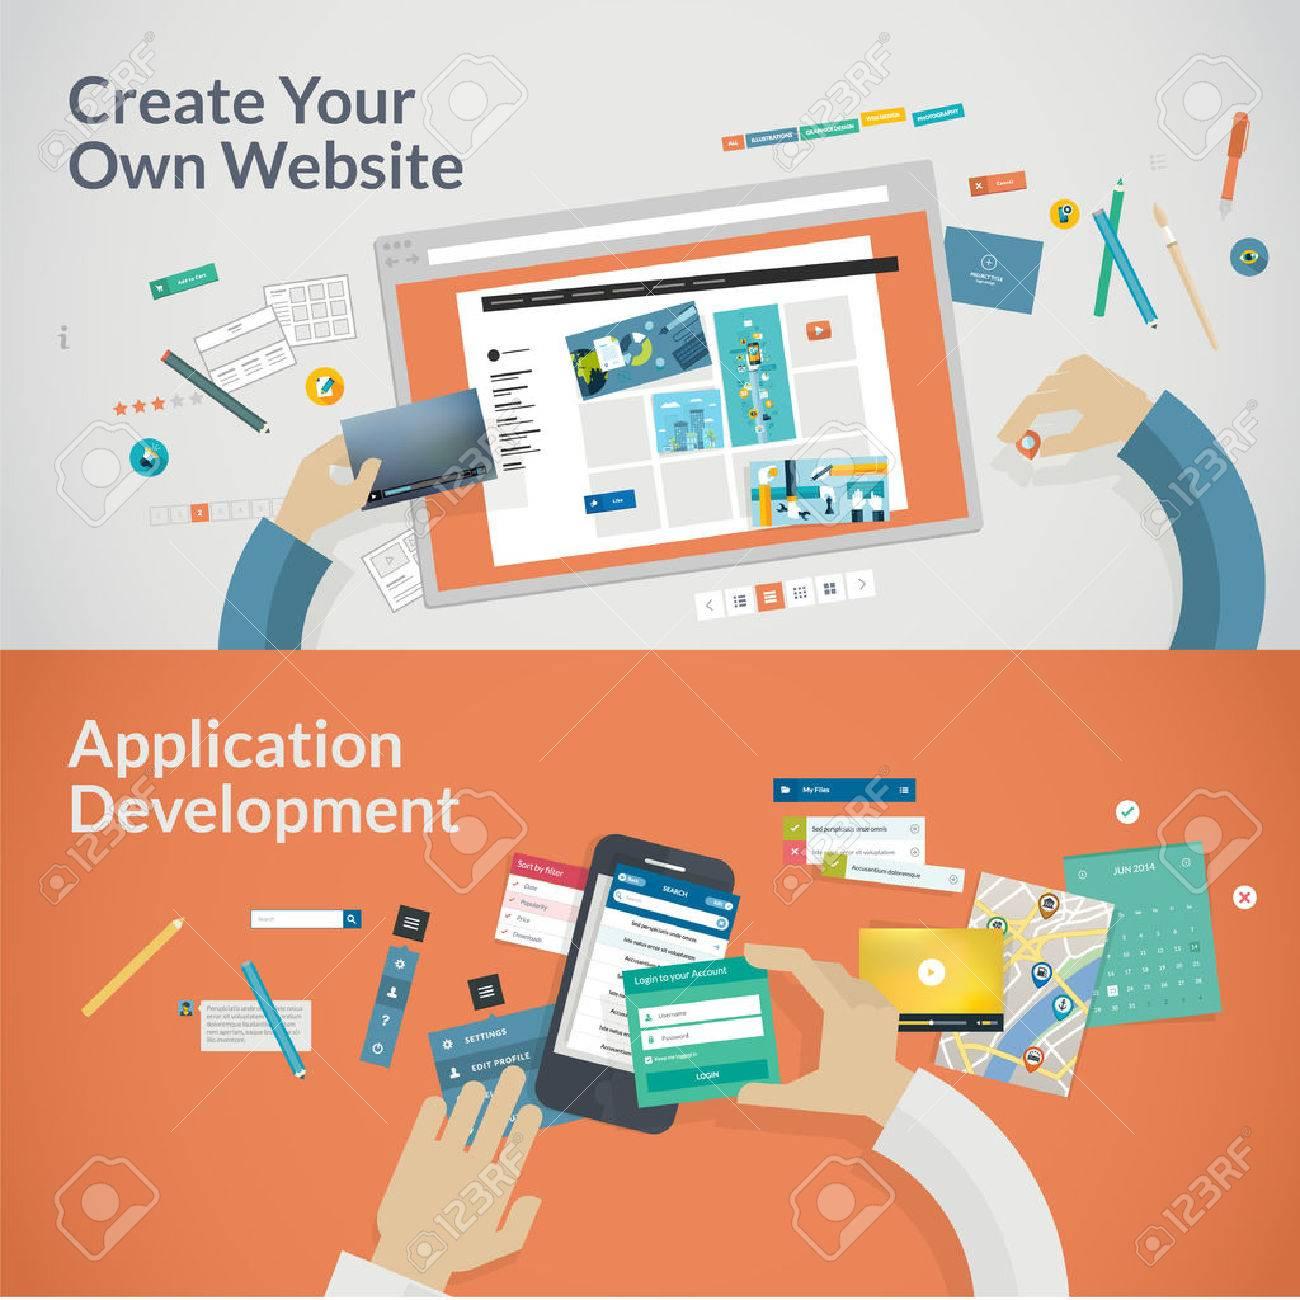 Set of flat design concepts for web development Concepts for web design, programming and SEO - 30826127